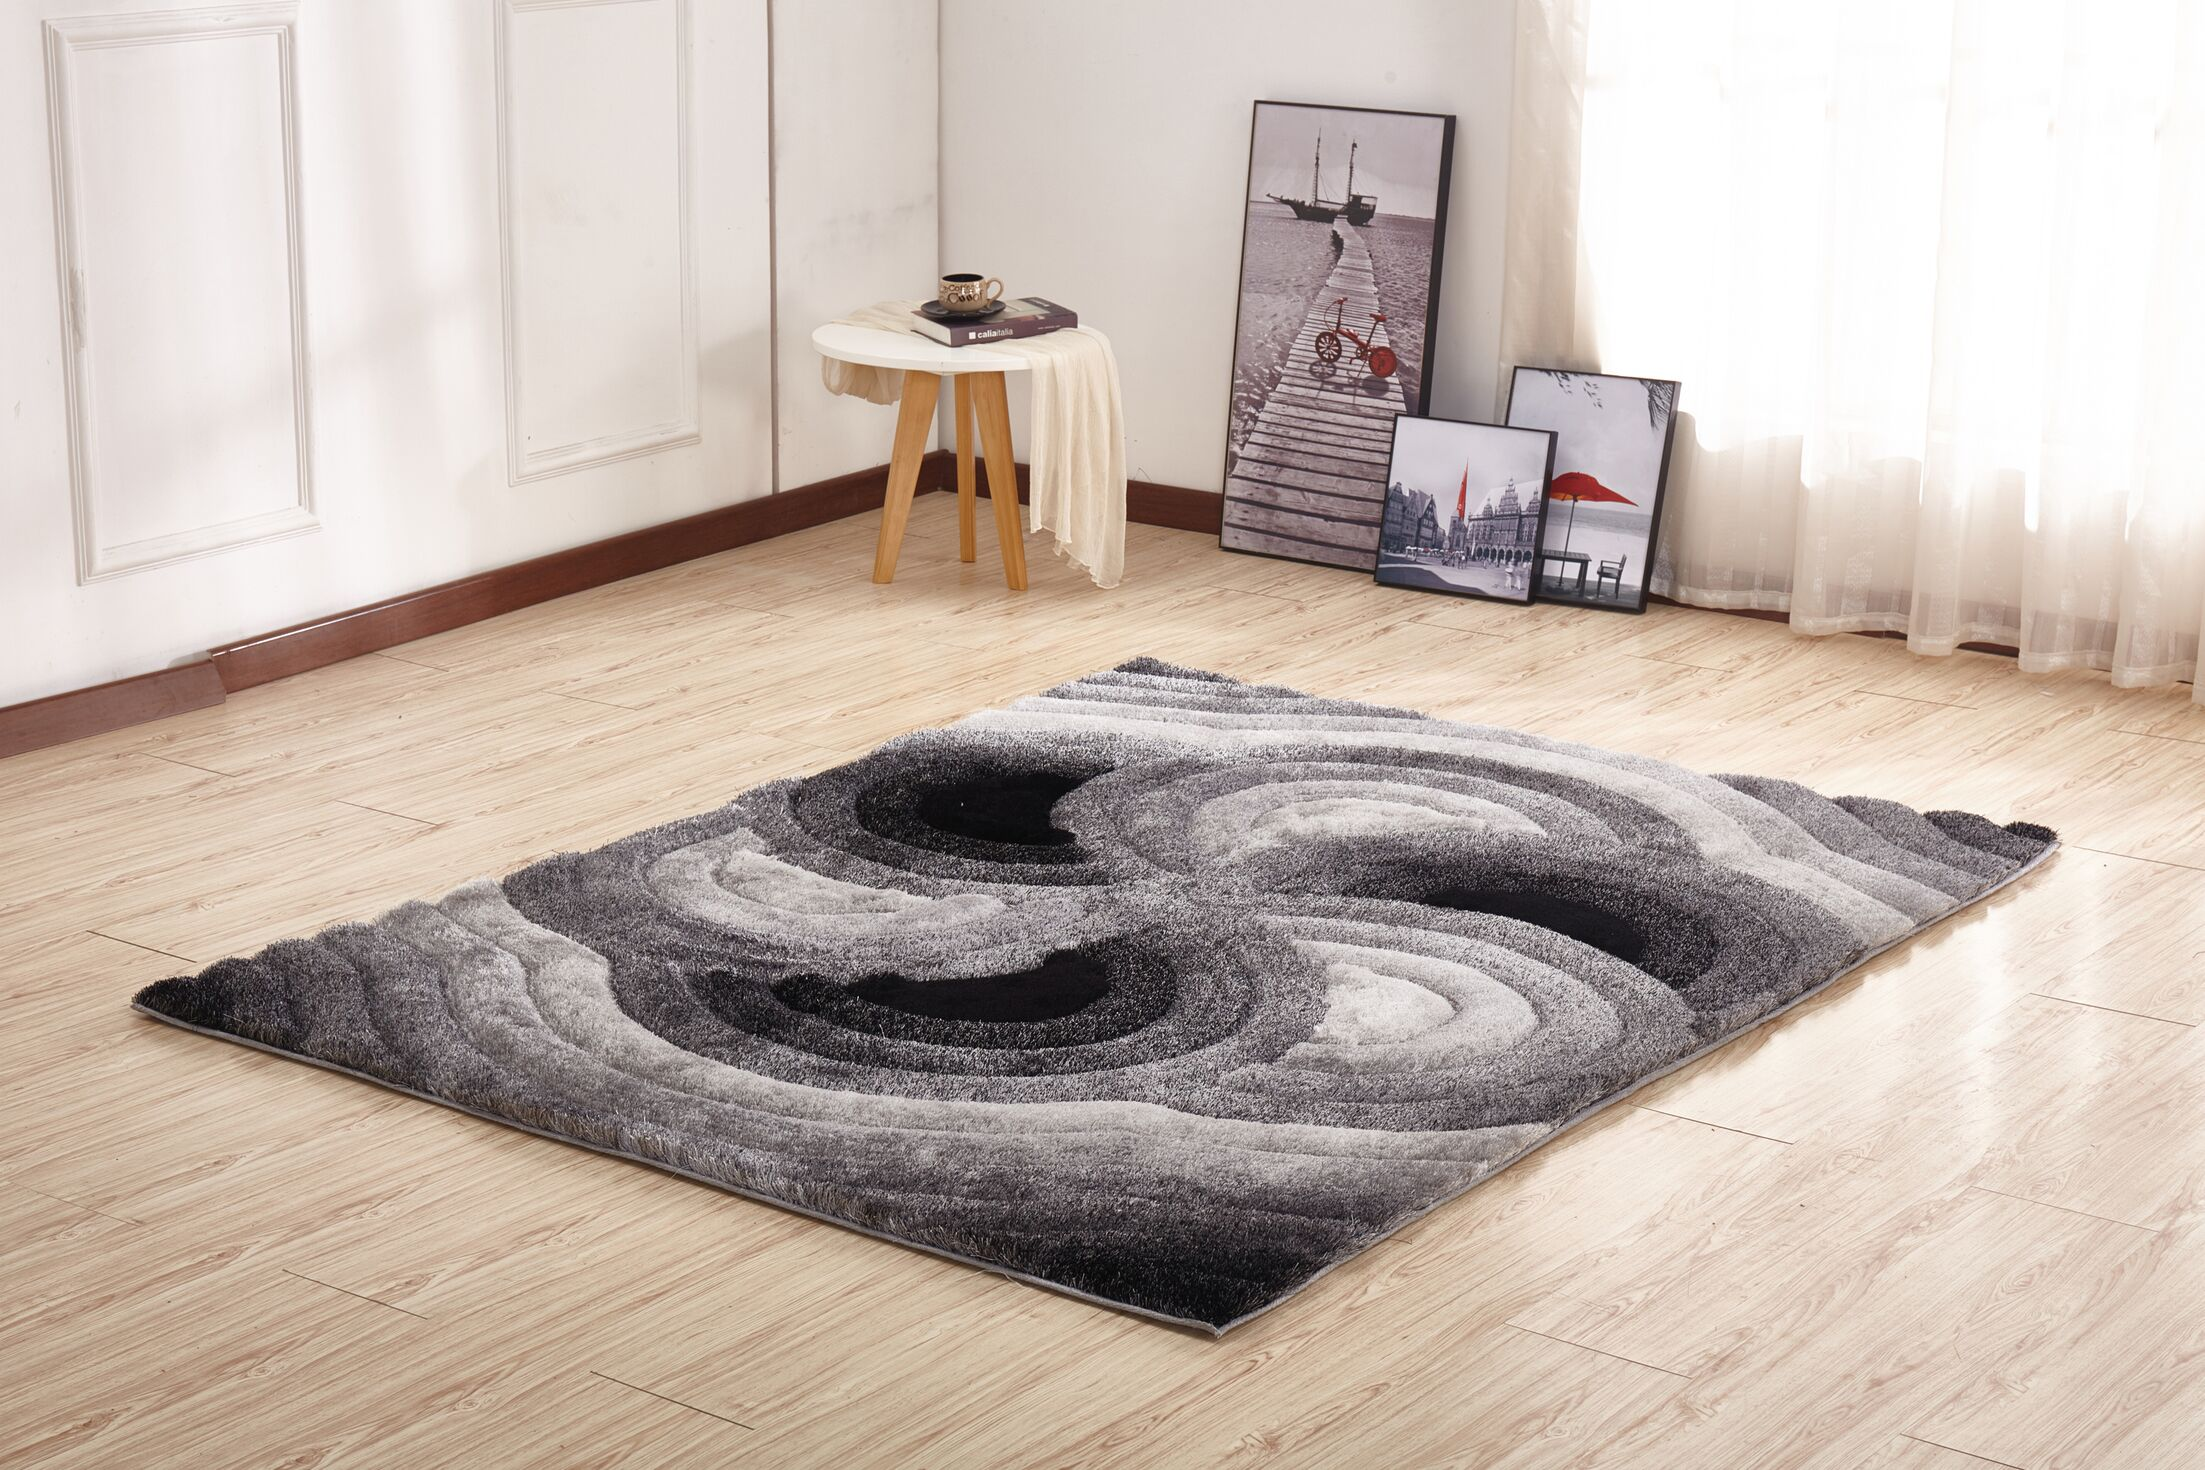 Walk Shaggy 3D Gray Indoor/Outdoor Area Rug